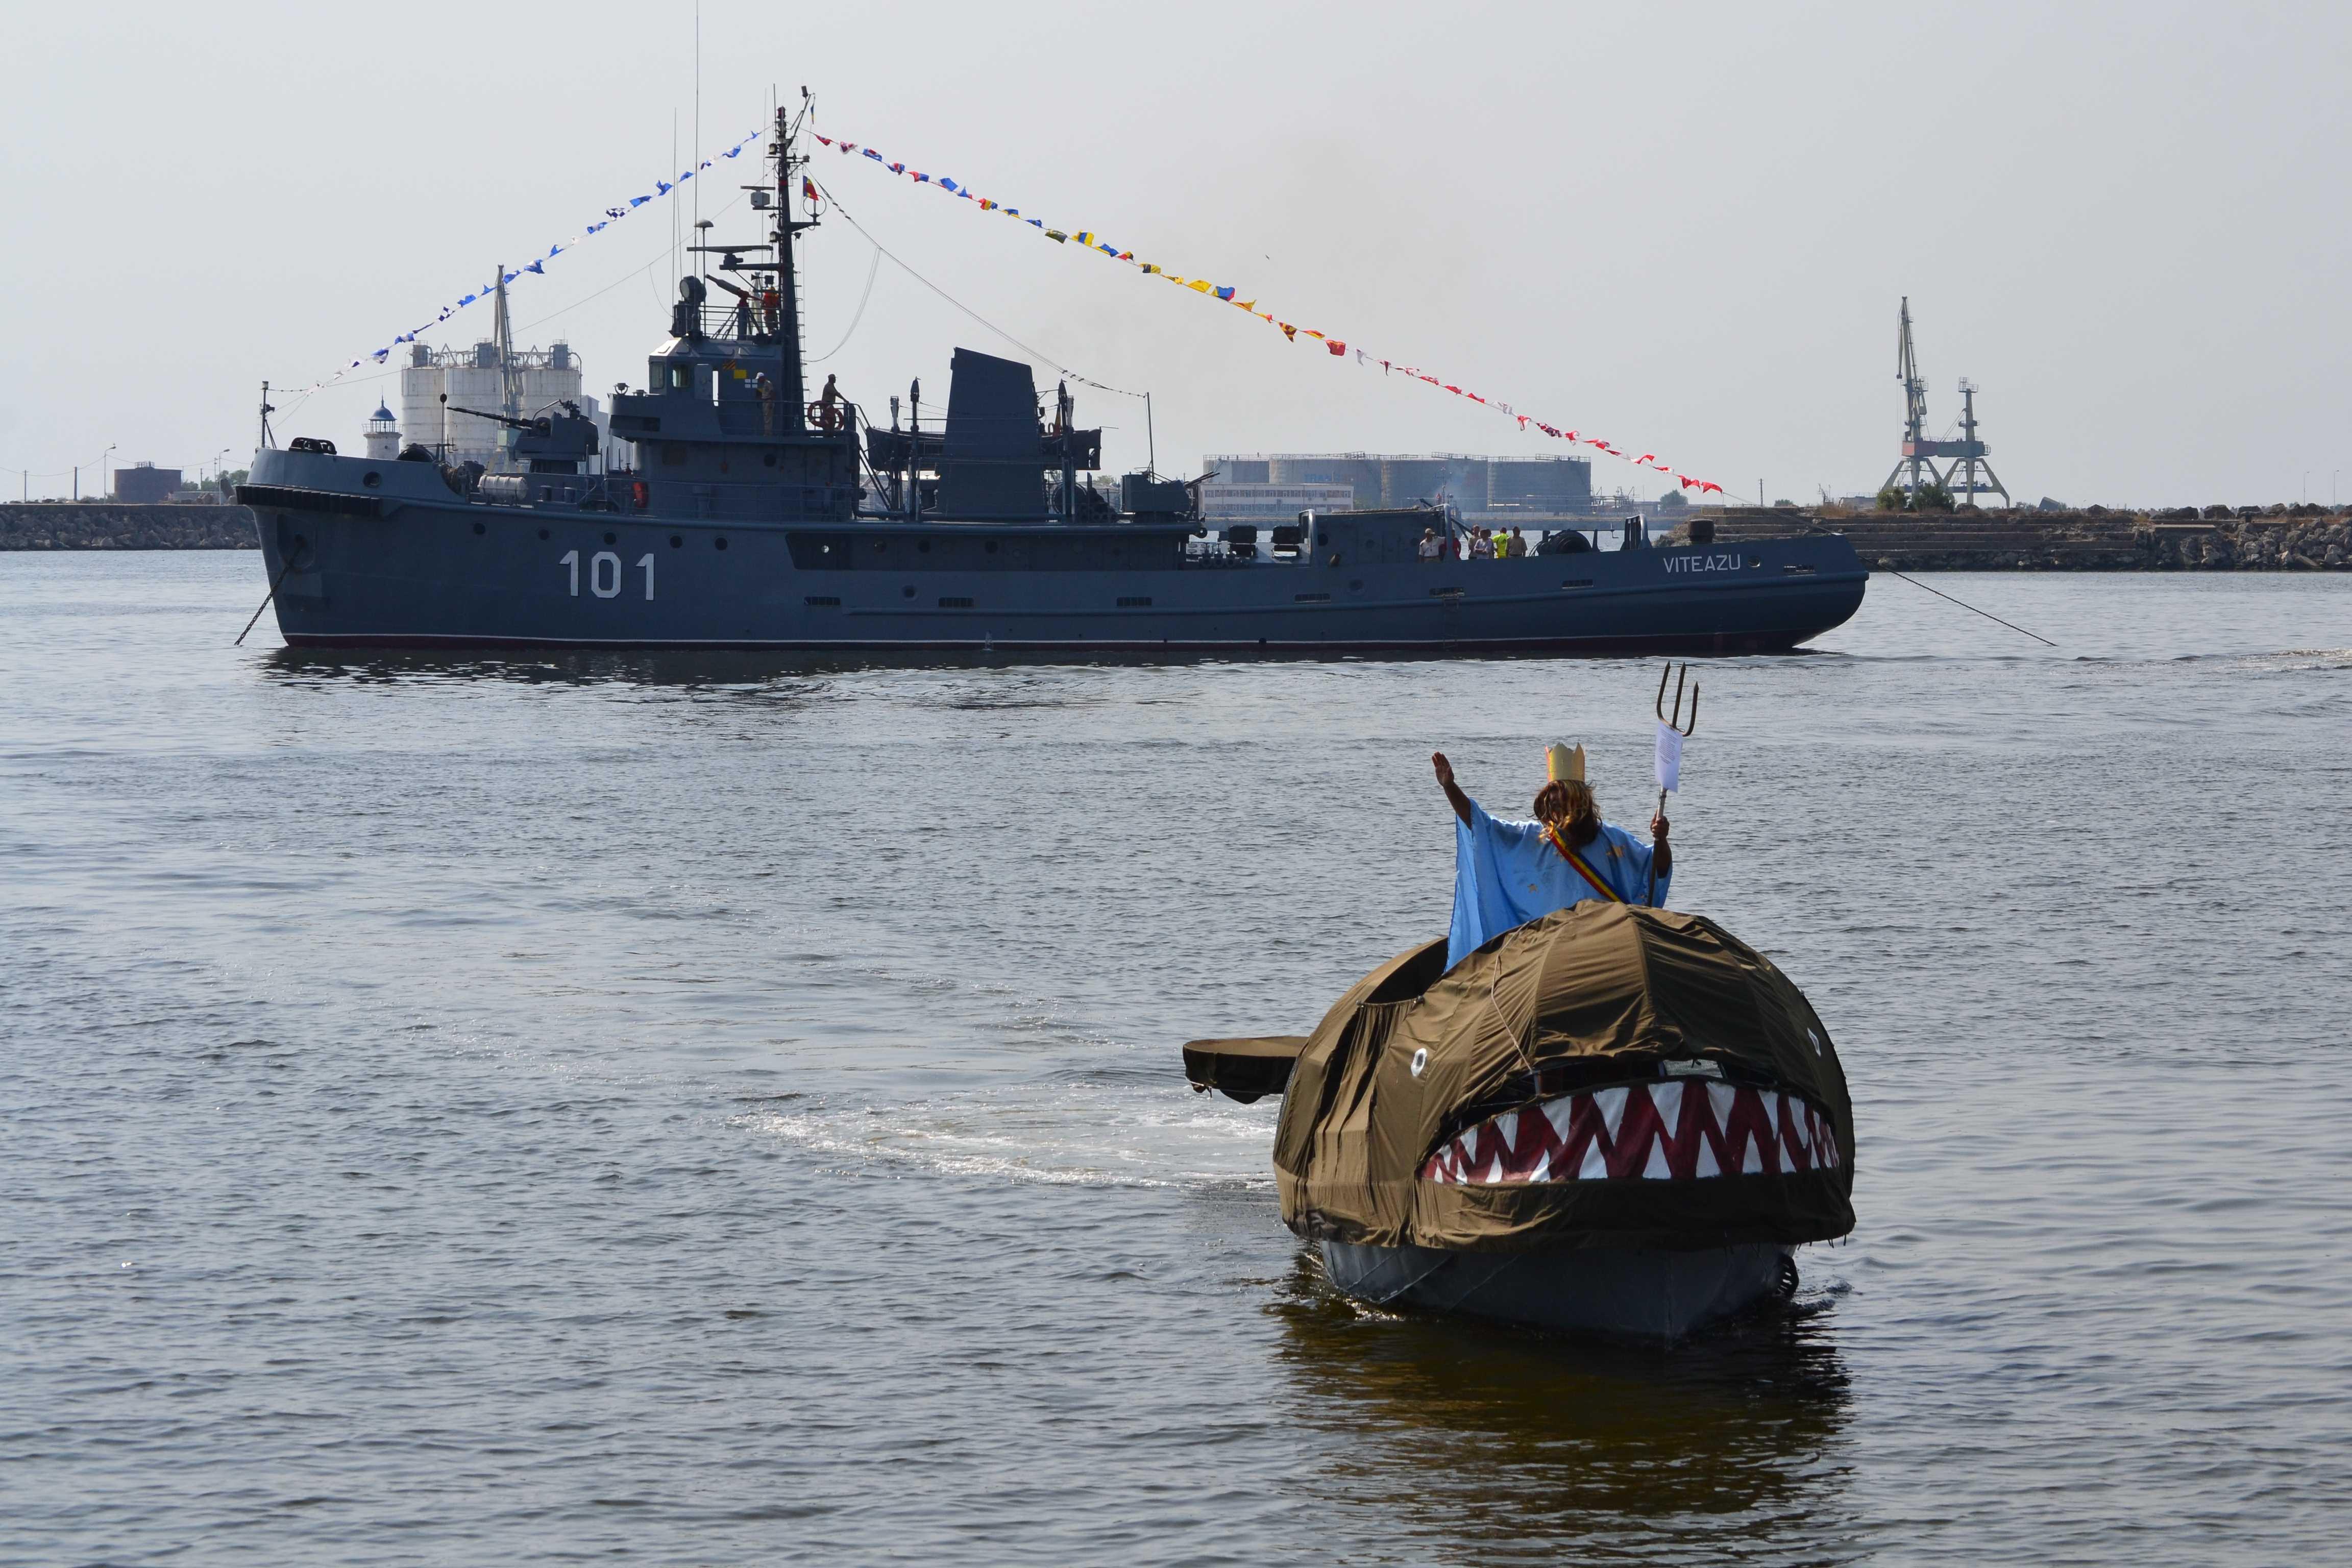 Ziua Marinei sarbatorita la Mangalia